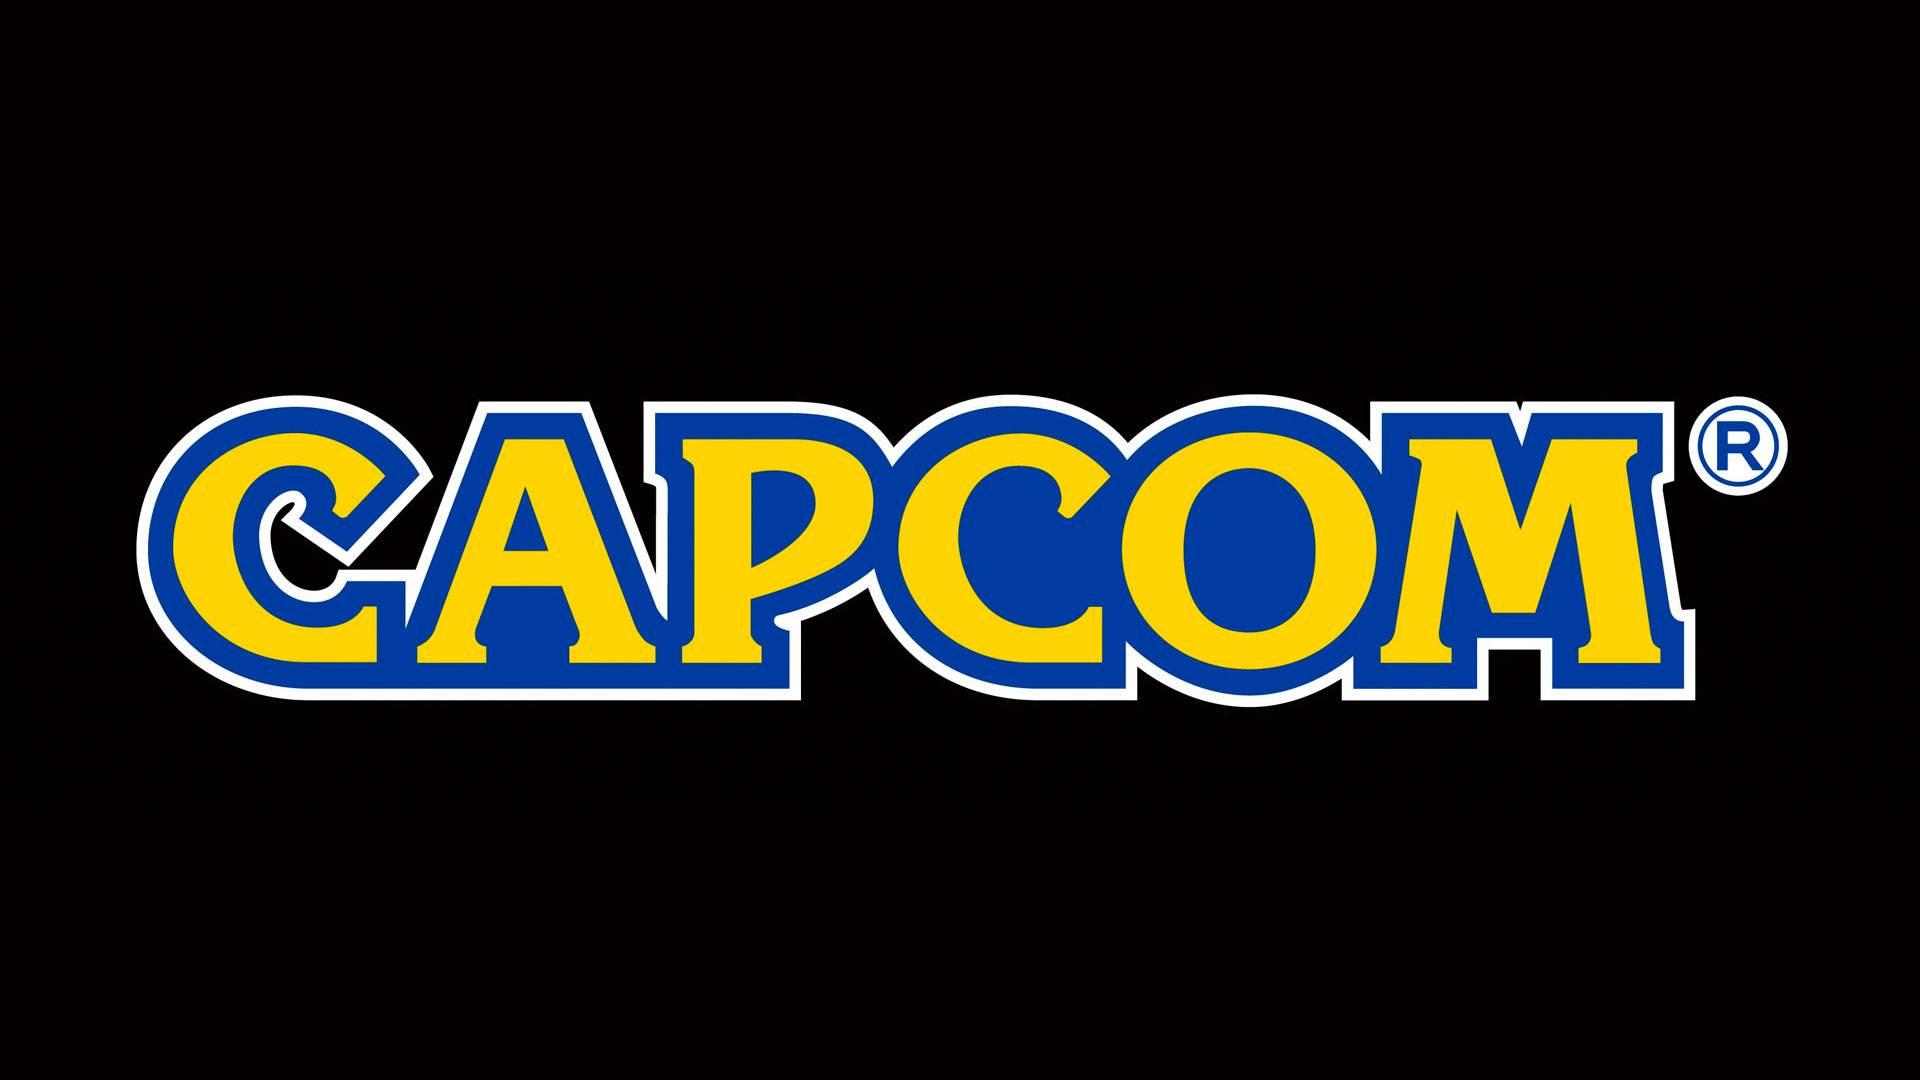 Capcom hackeo